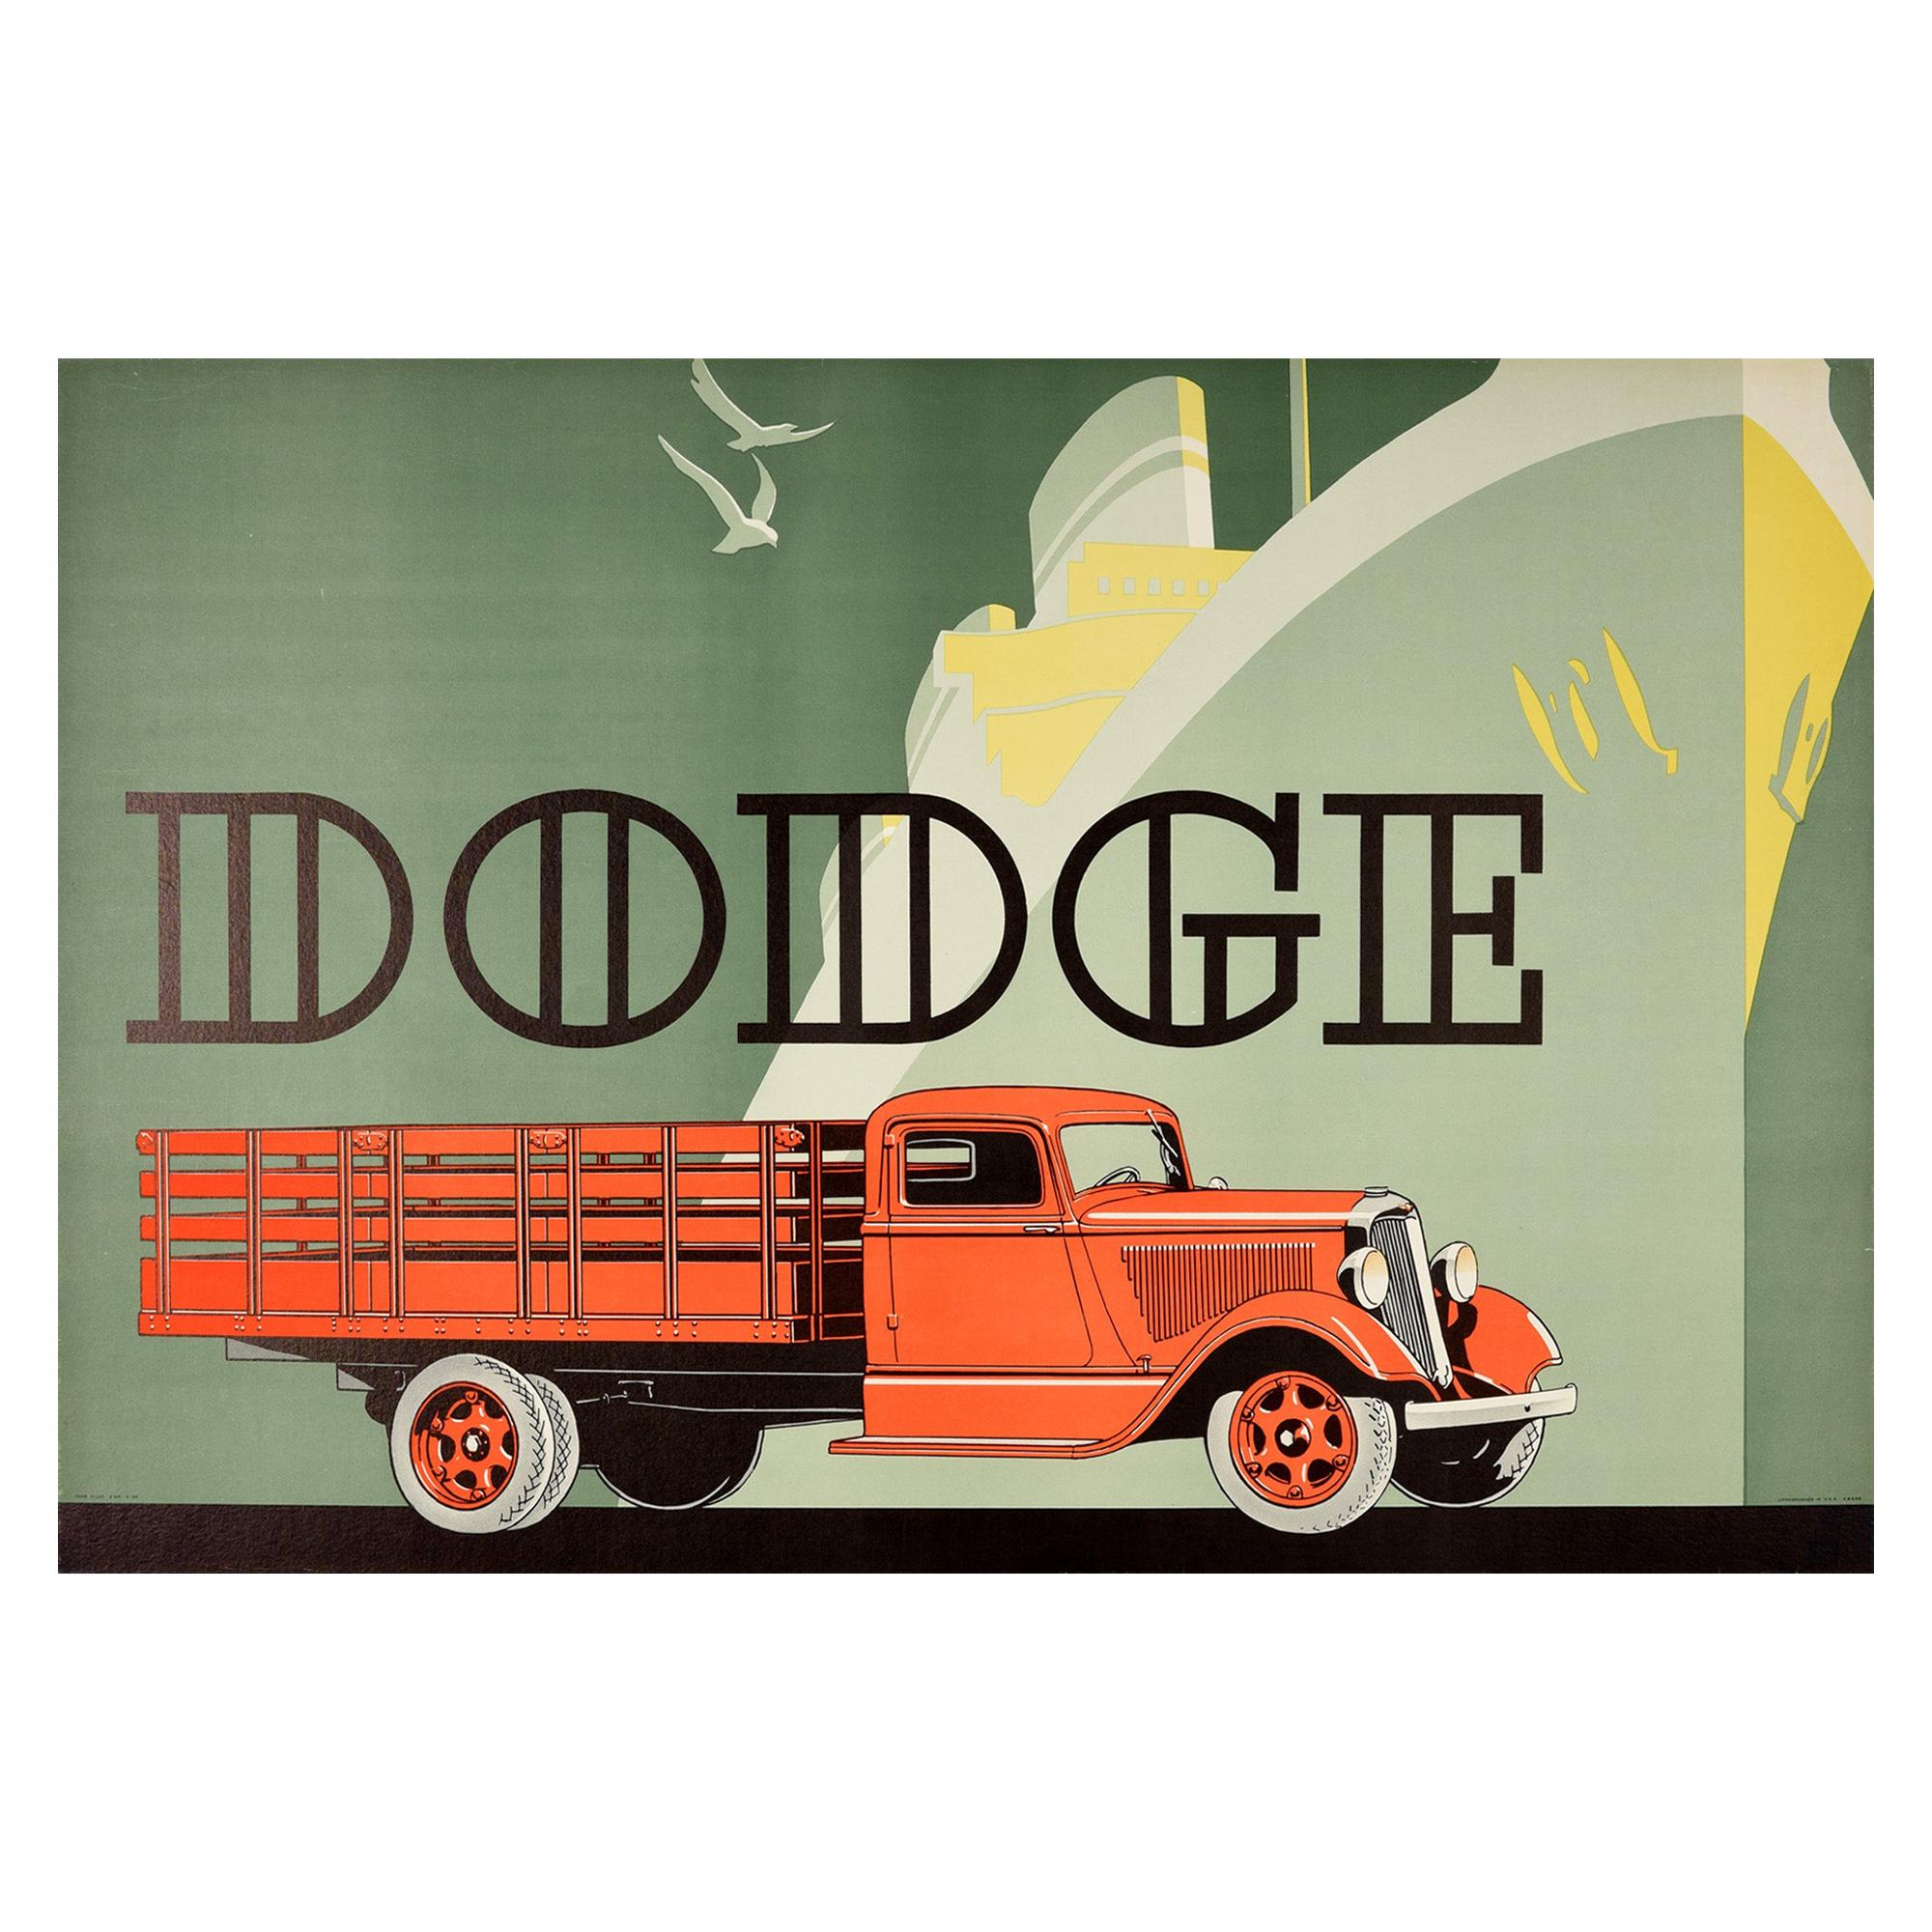 Original Vintage Poster Dodge Truck America Art Deco Cruise Ship Liner Design